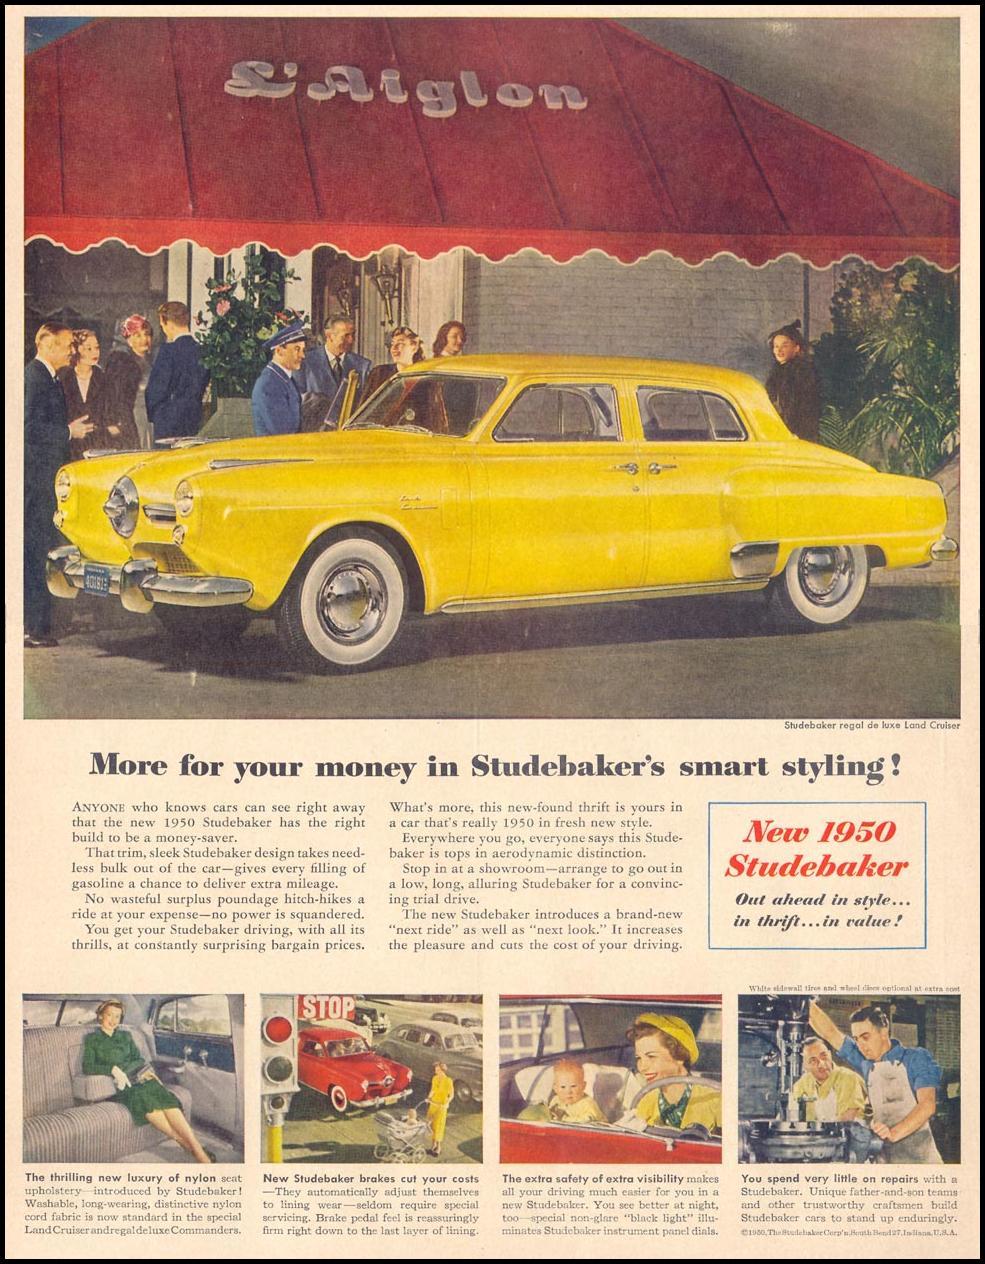 STUDEBAKER AUTOMOBILES LIFE 04/17/1950 p. 58